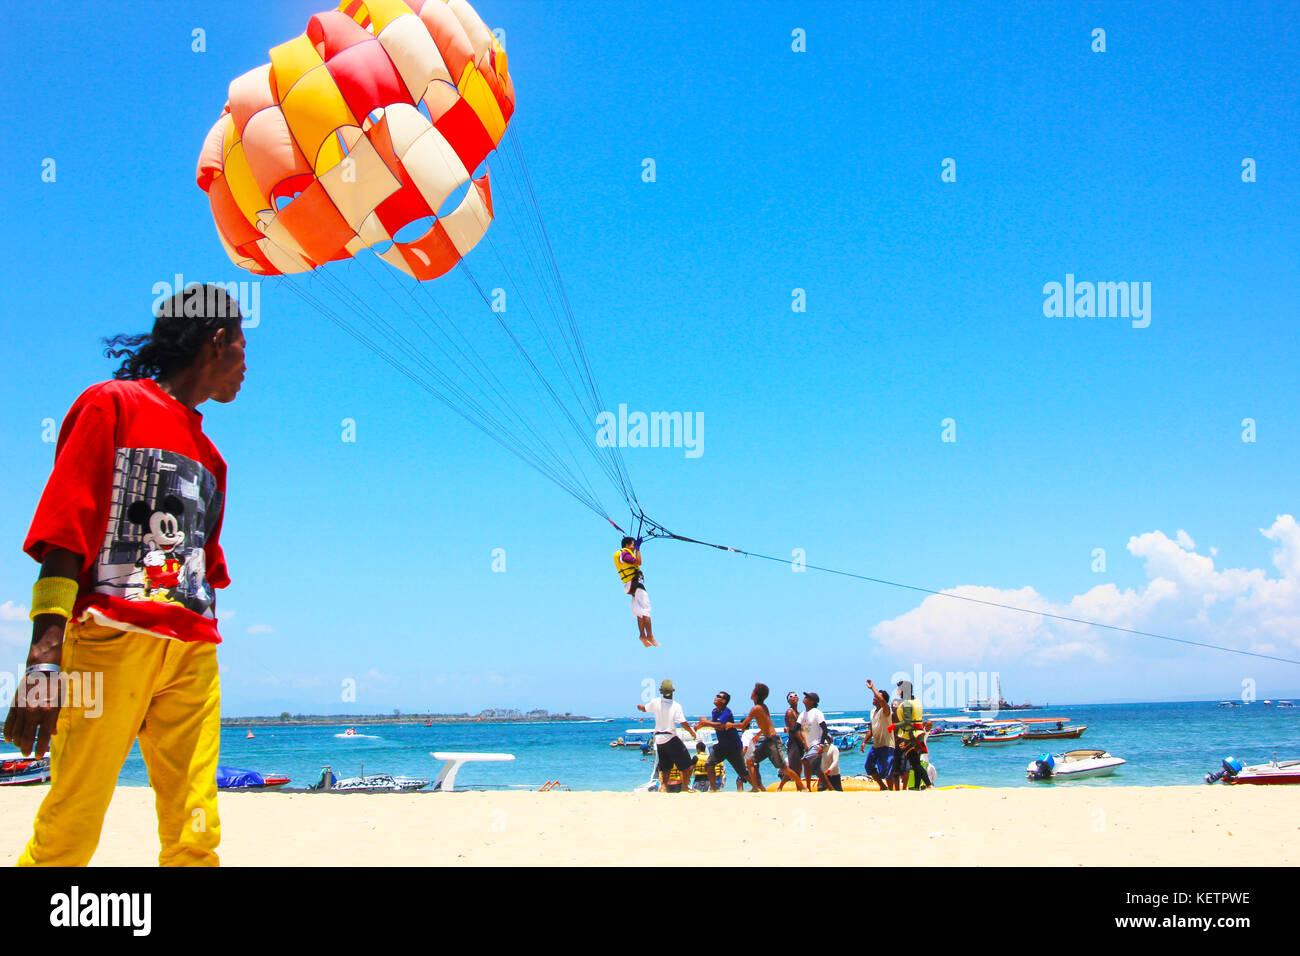 Water Sport in Bali Island Indonesia - Stock Image